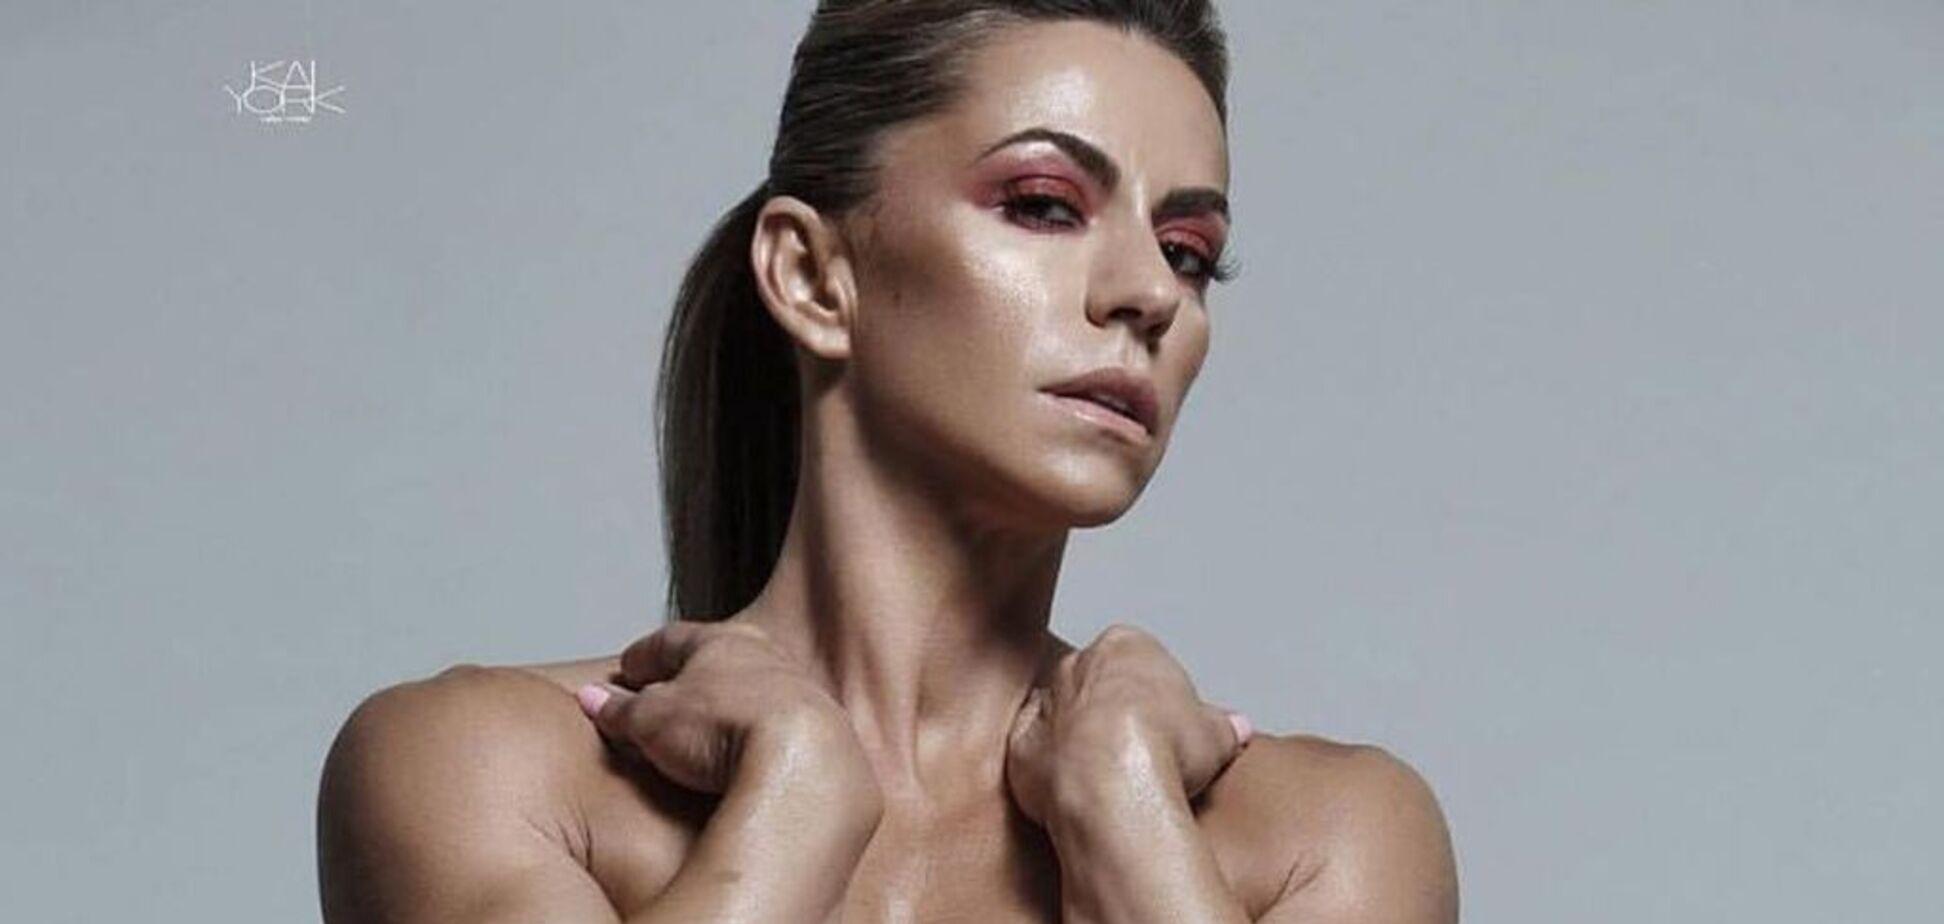 'Ох*енеть!' 4-кратная чемпионка Олимпии поразила фото топлес